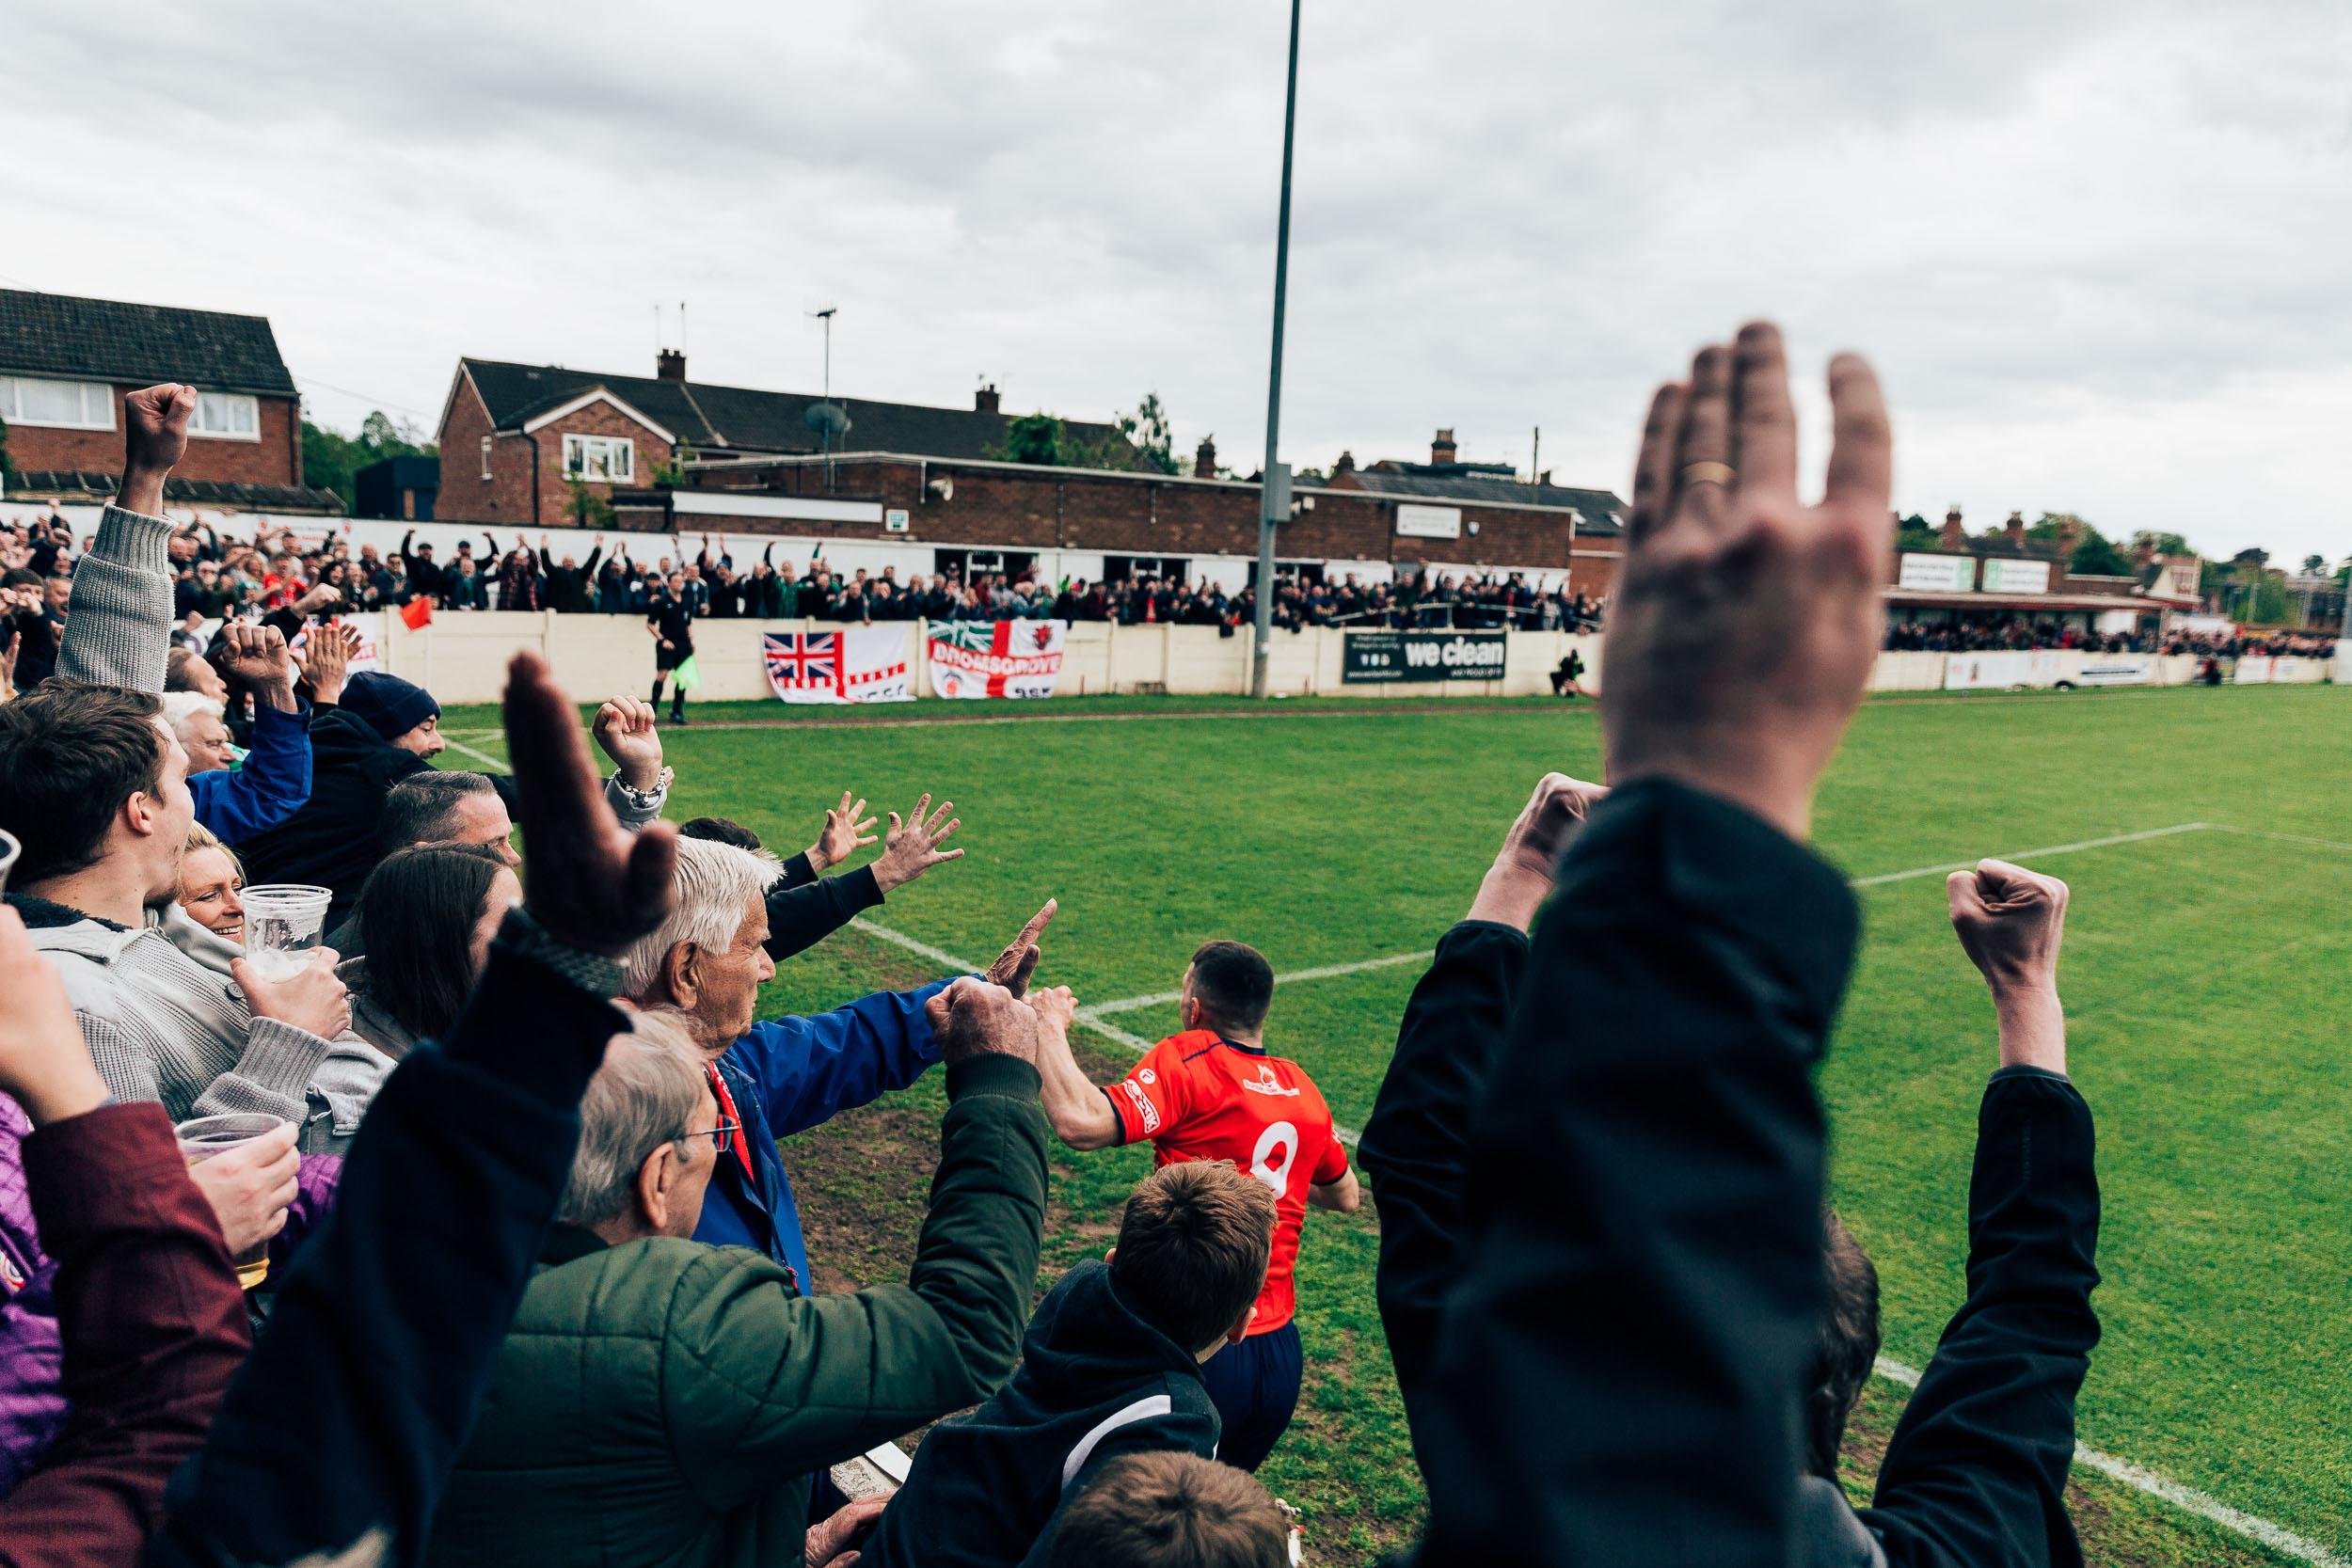 06_05_2019_Bromsgrove_Sporting_Corby-106.jpg